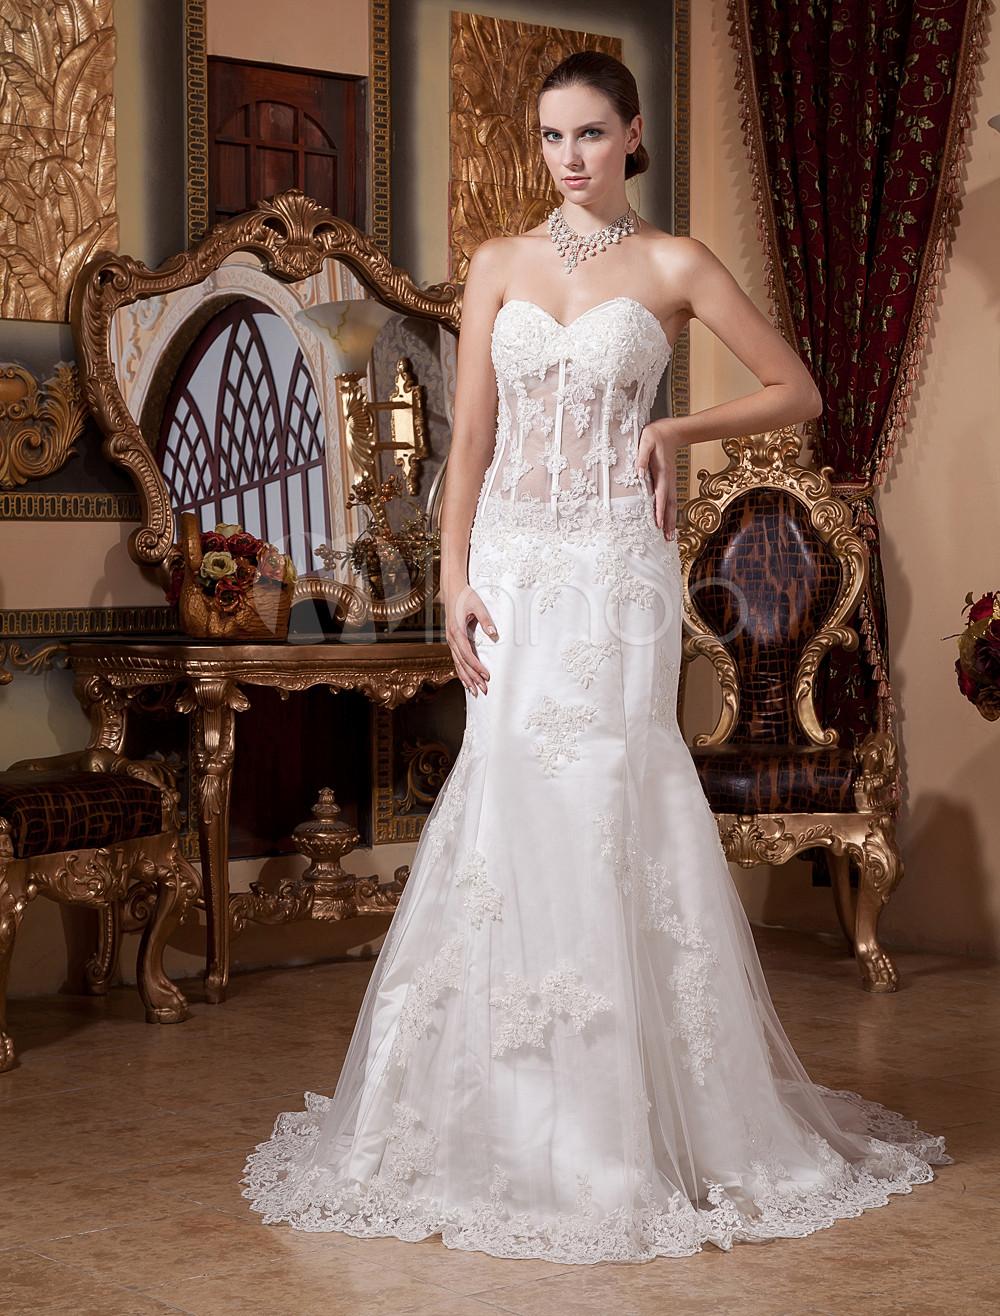 White Semi-Sheer Waist Mermaid Trumpet Lace Wedding Dress - Milanoo.com